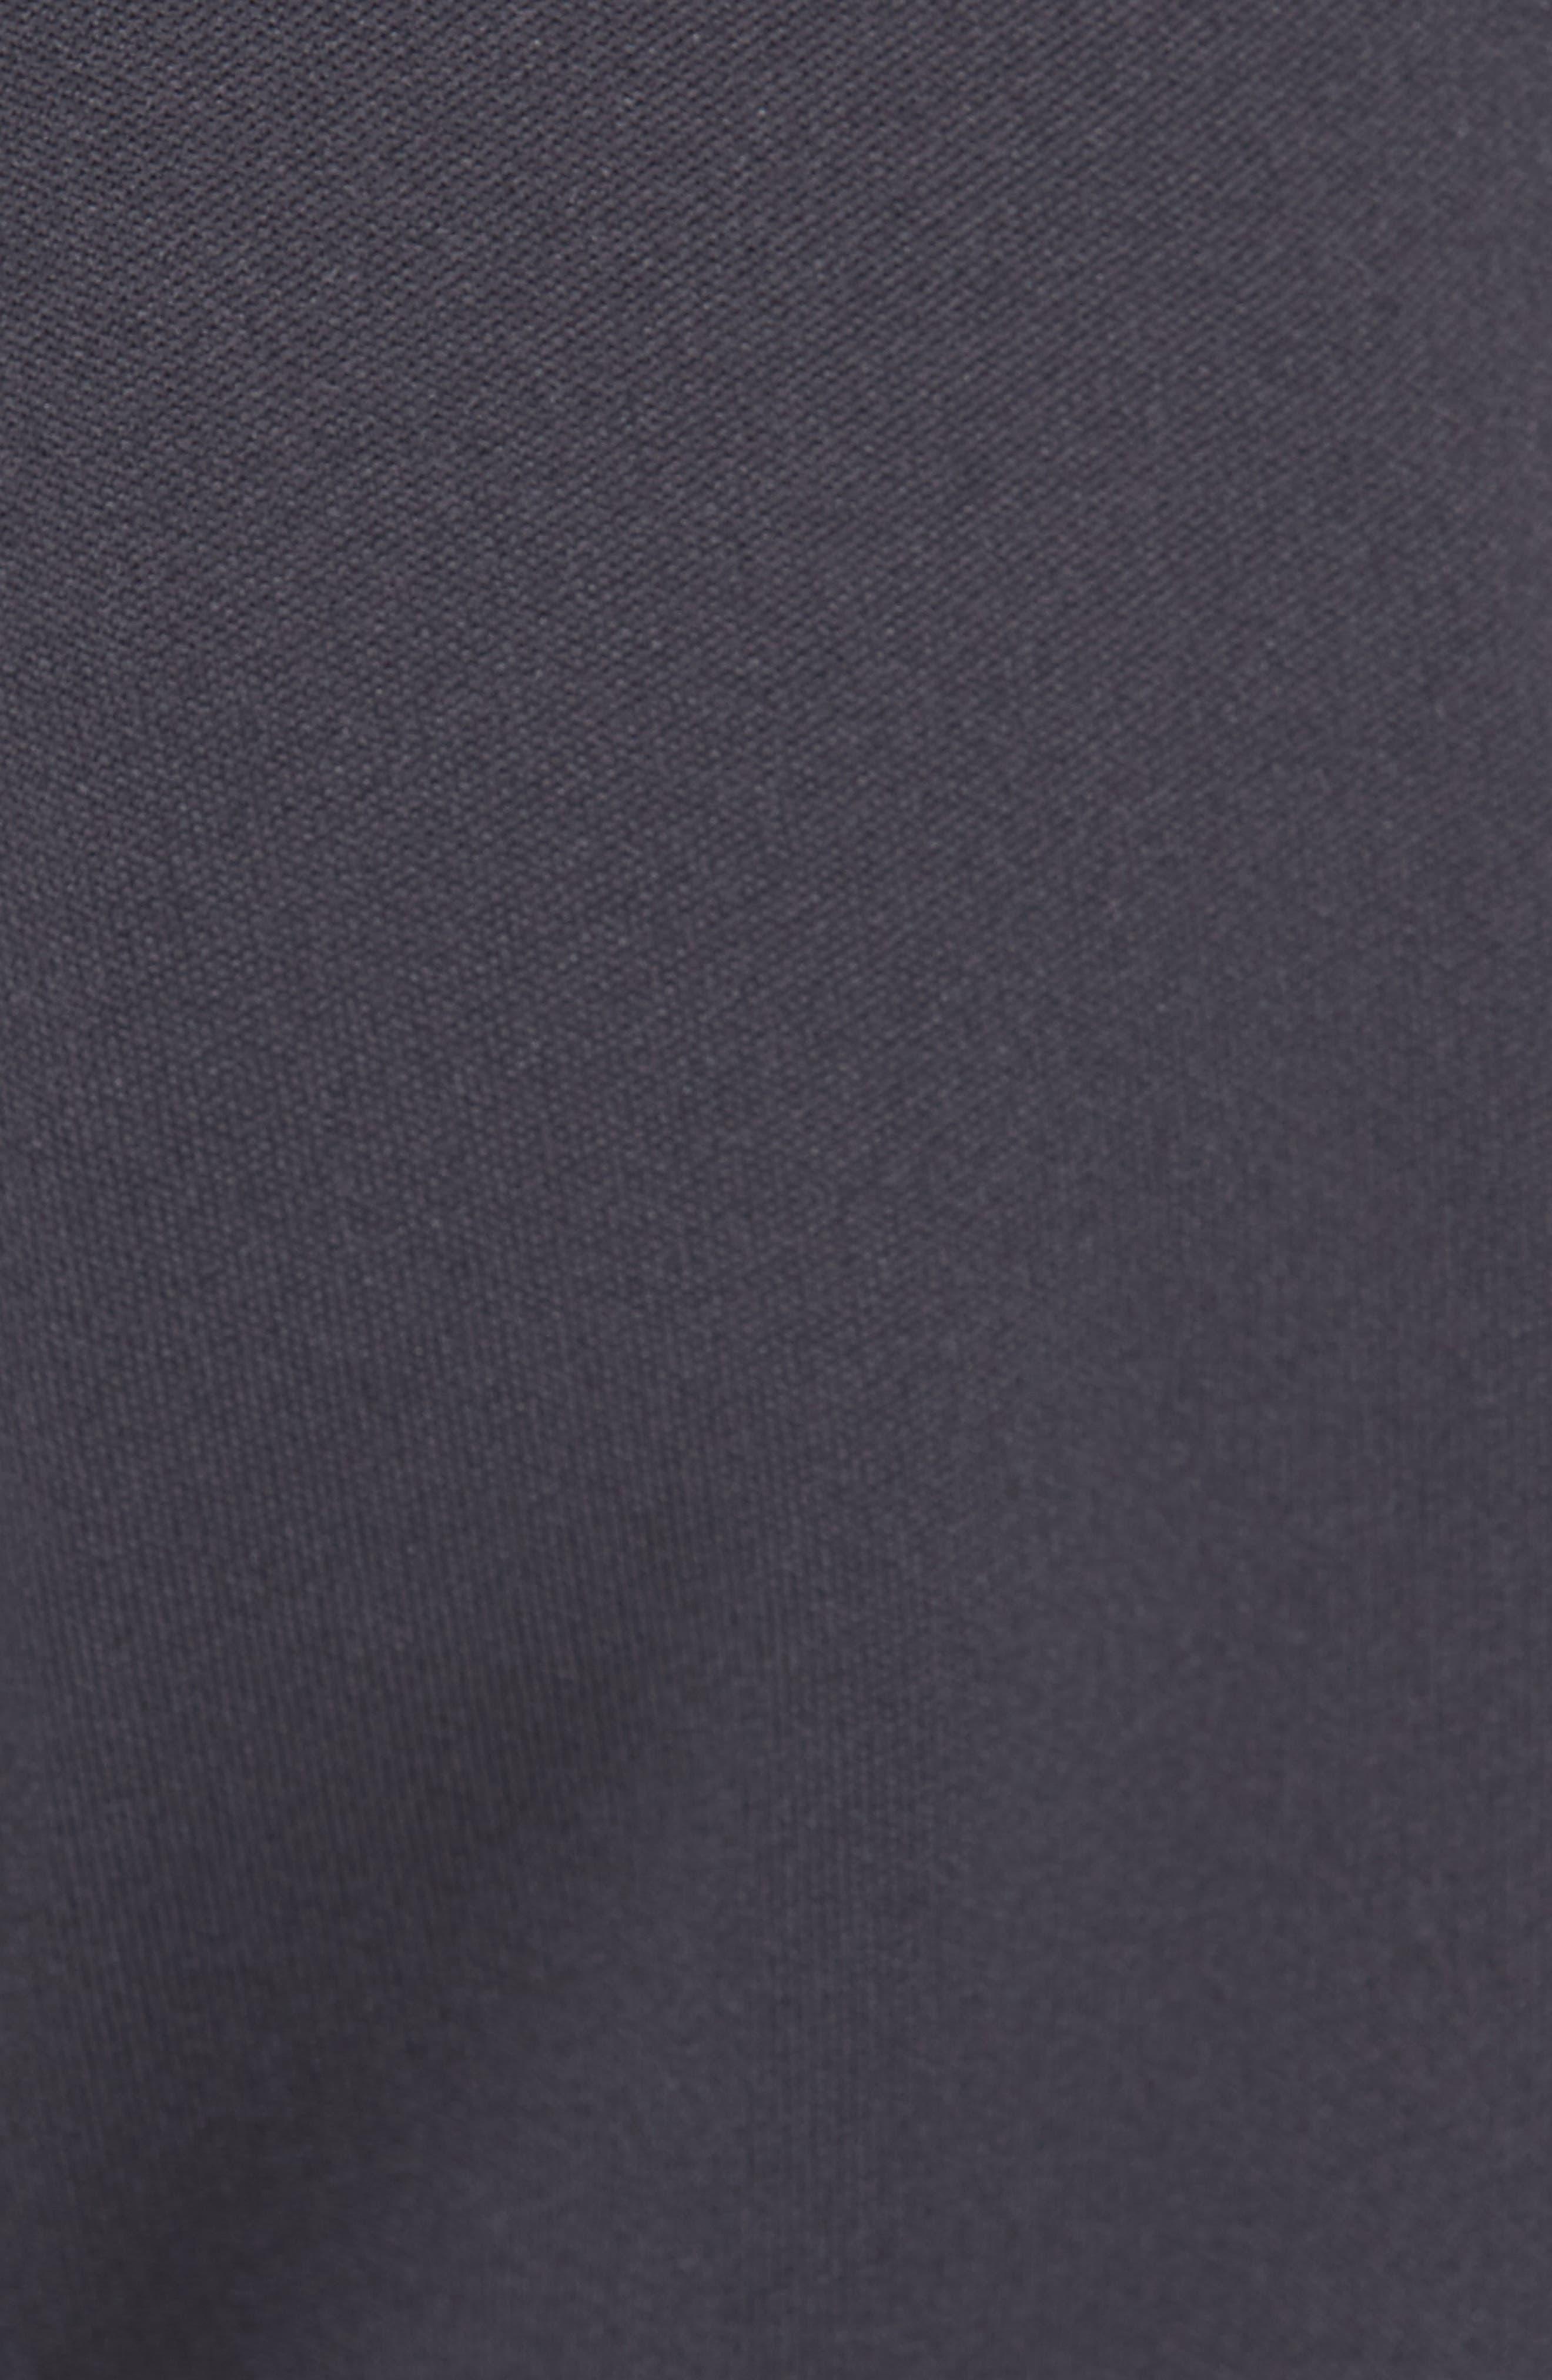 New Classic Sweatpants,                             Alternate thumbnail 5, color,                             DARK GREY